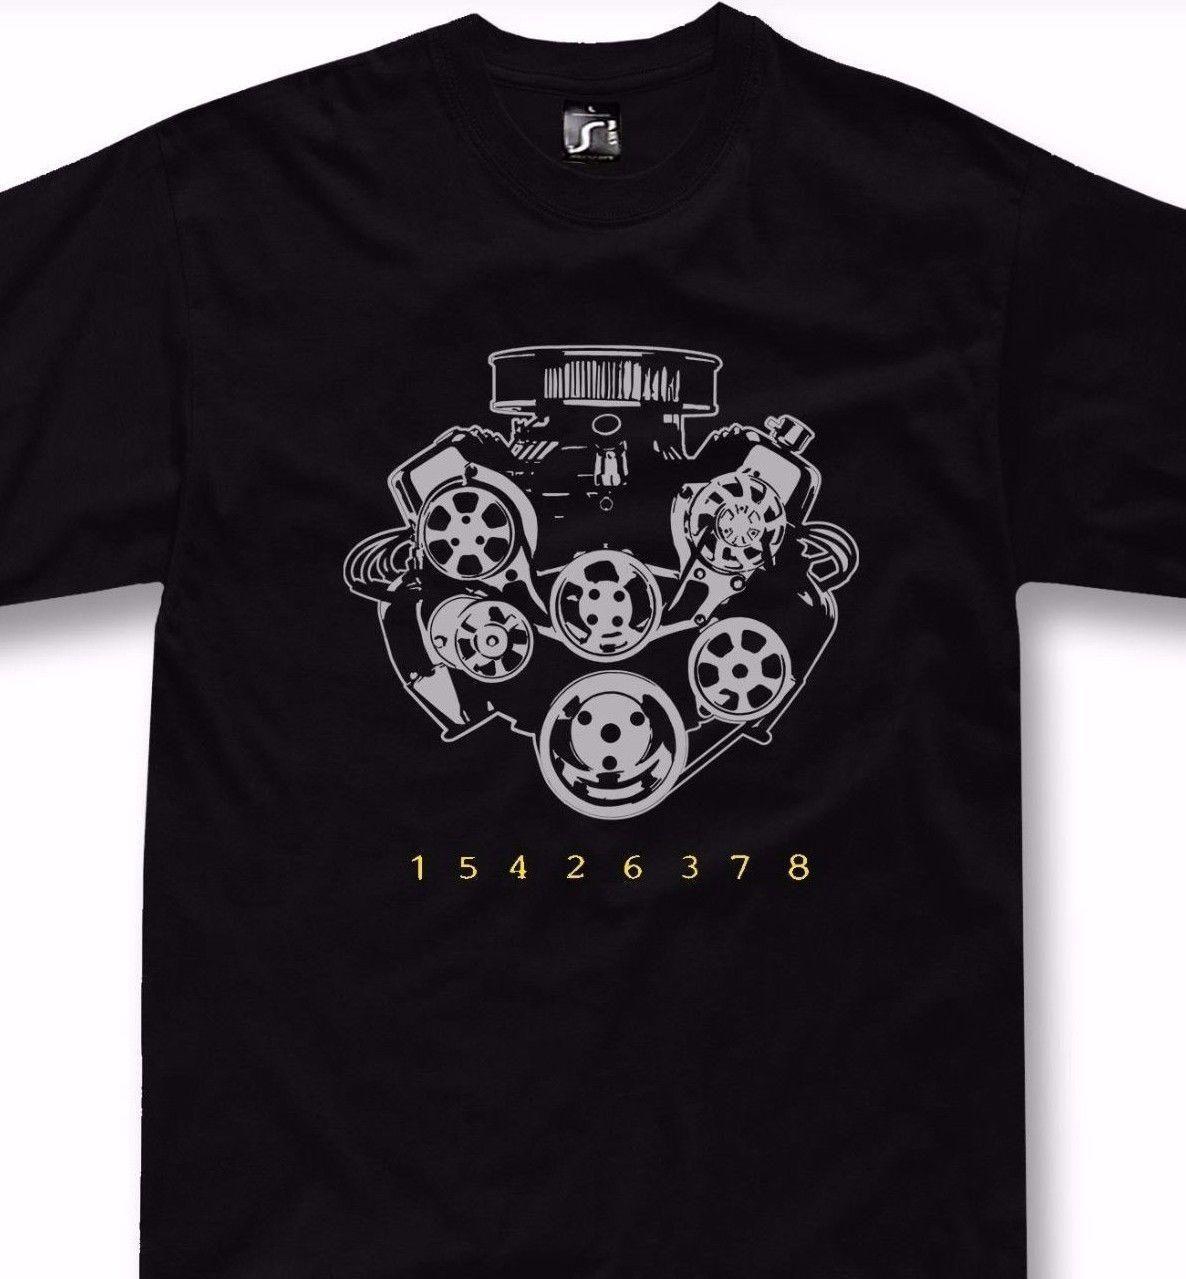 Mens Designer T Shirts Shirt V8 Engine T Shirt Big Block Chevrolet